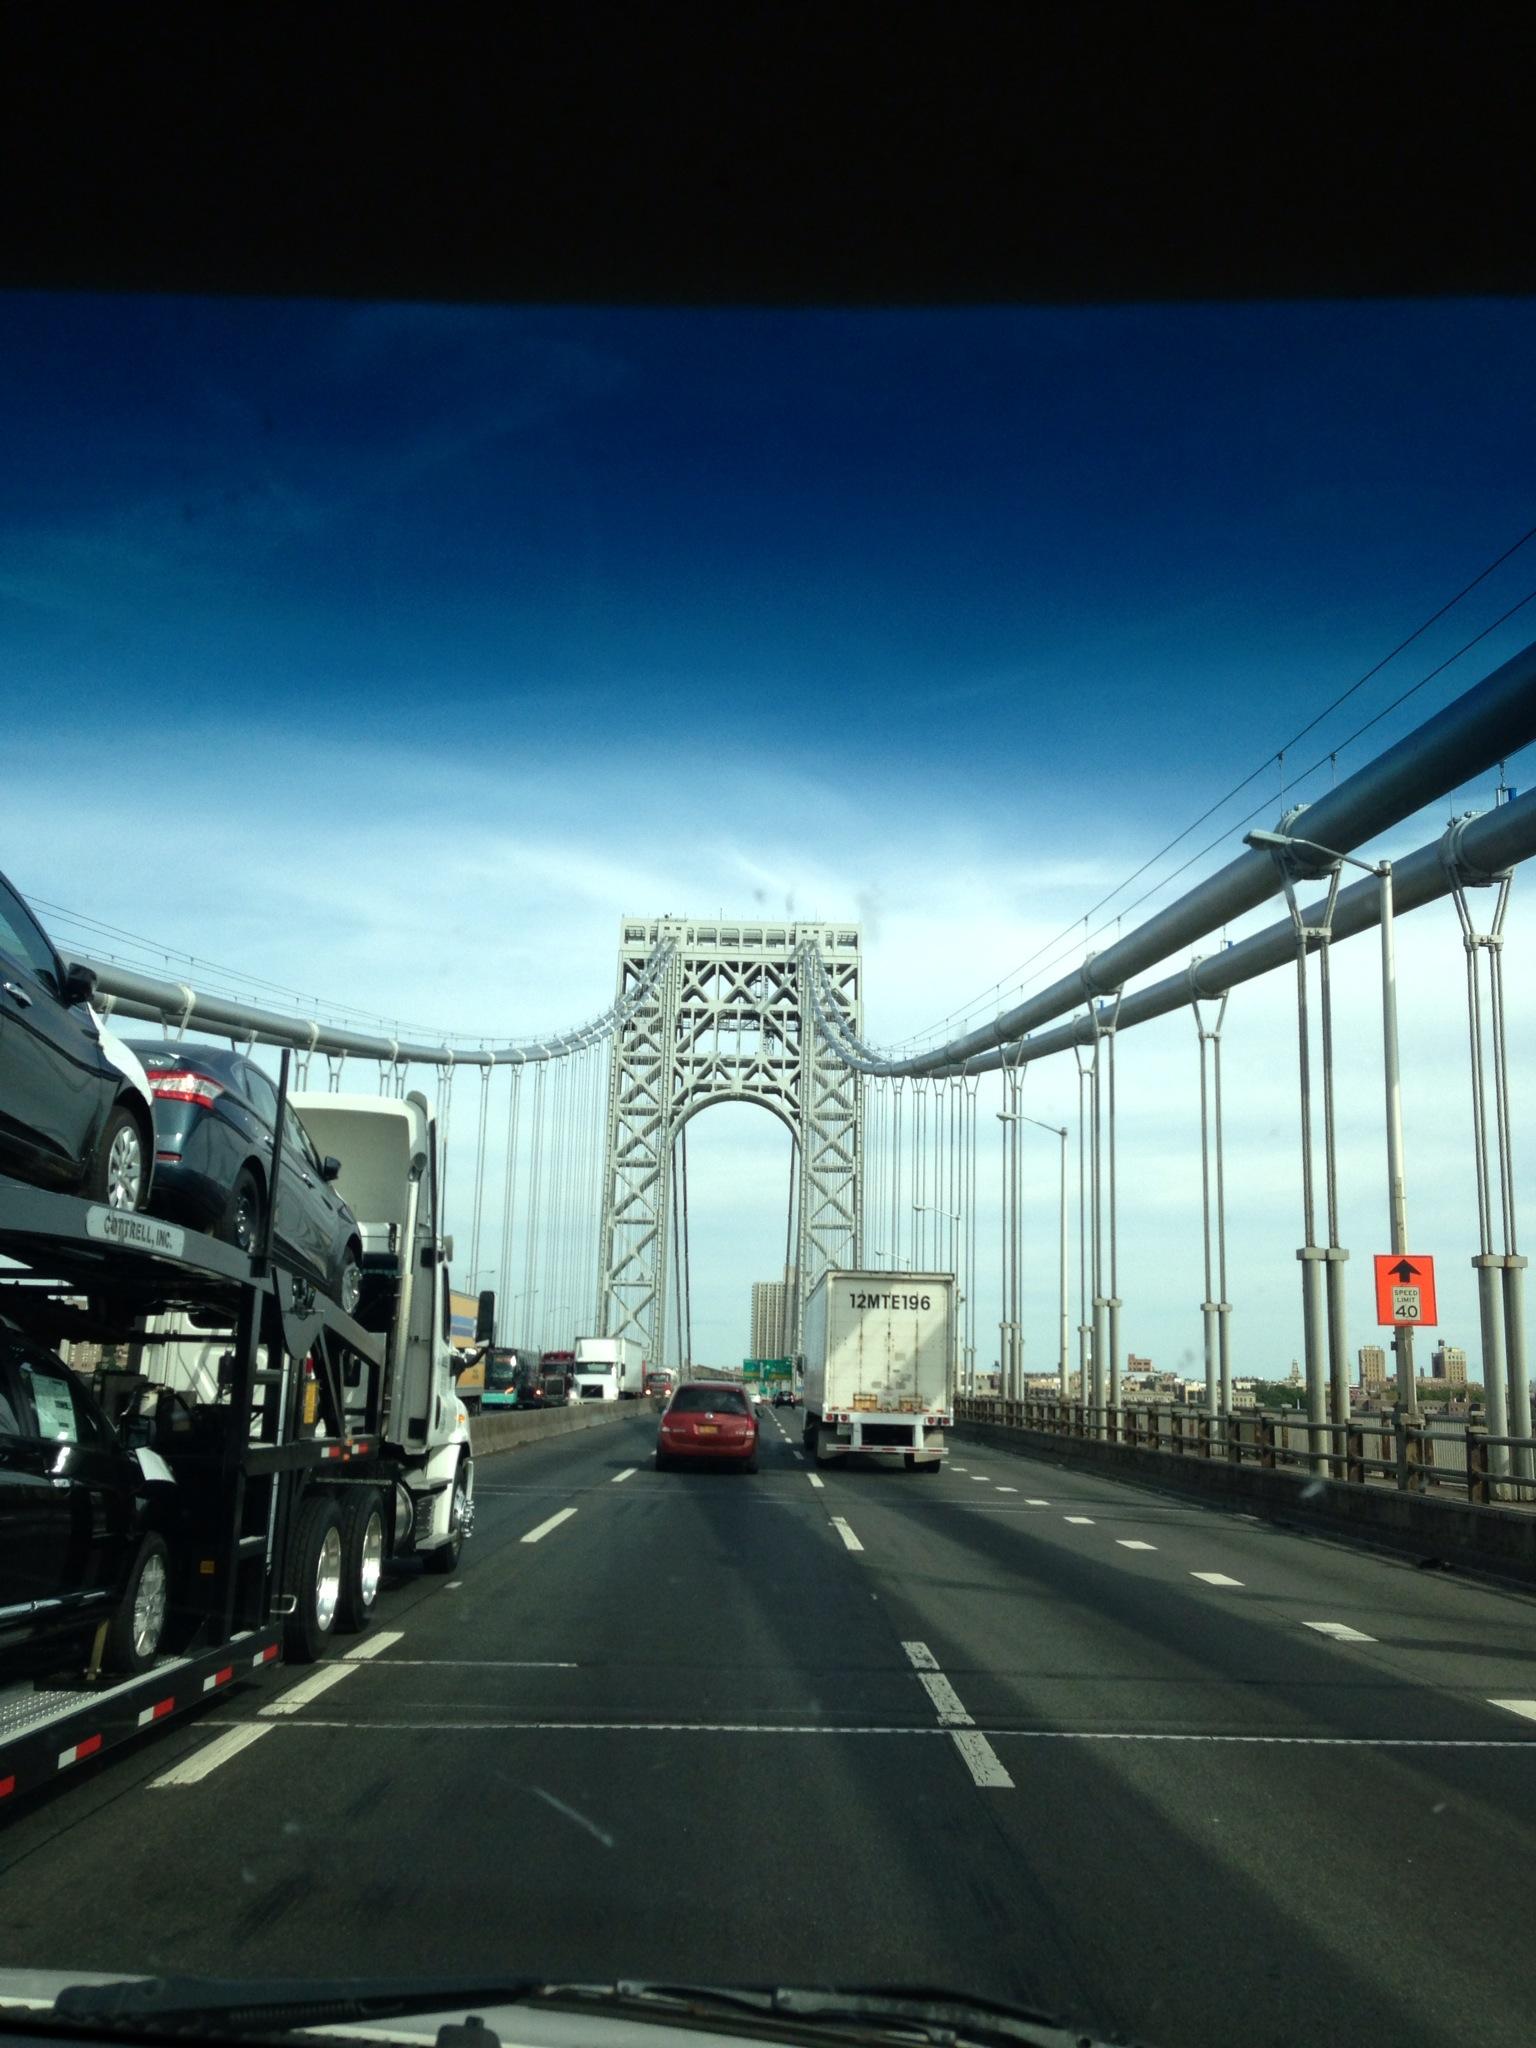 We paid $49 to cross this bridge!